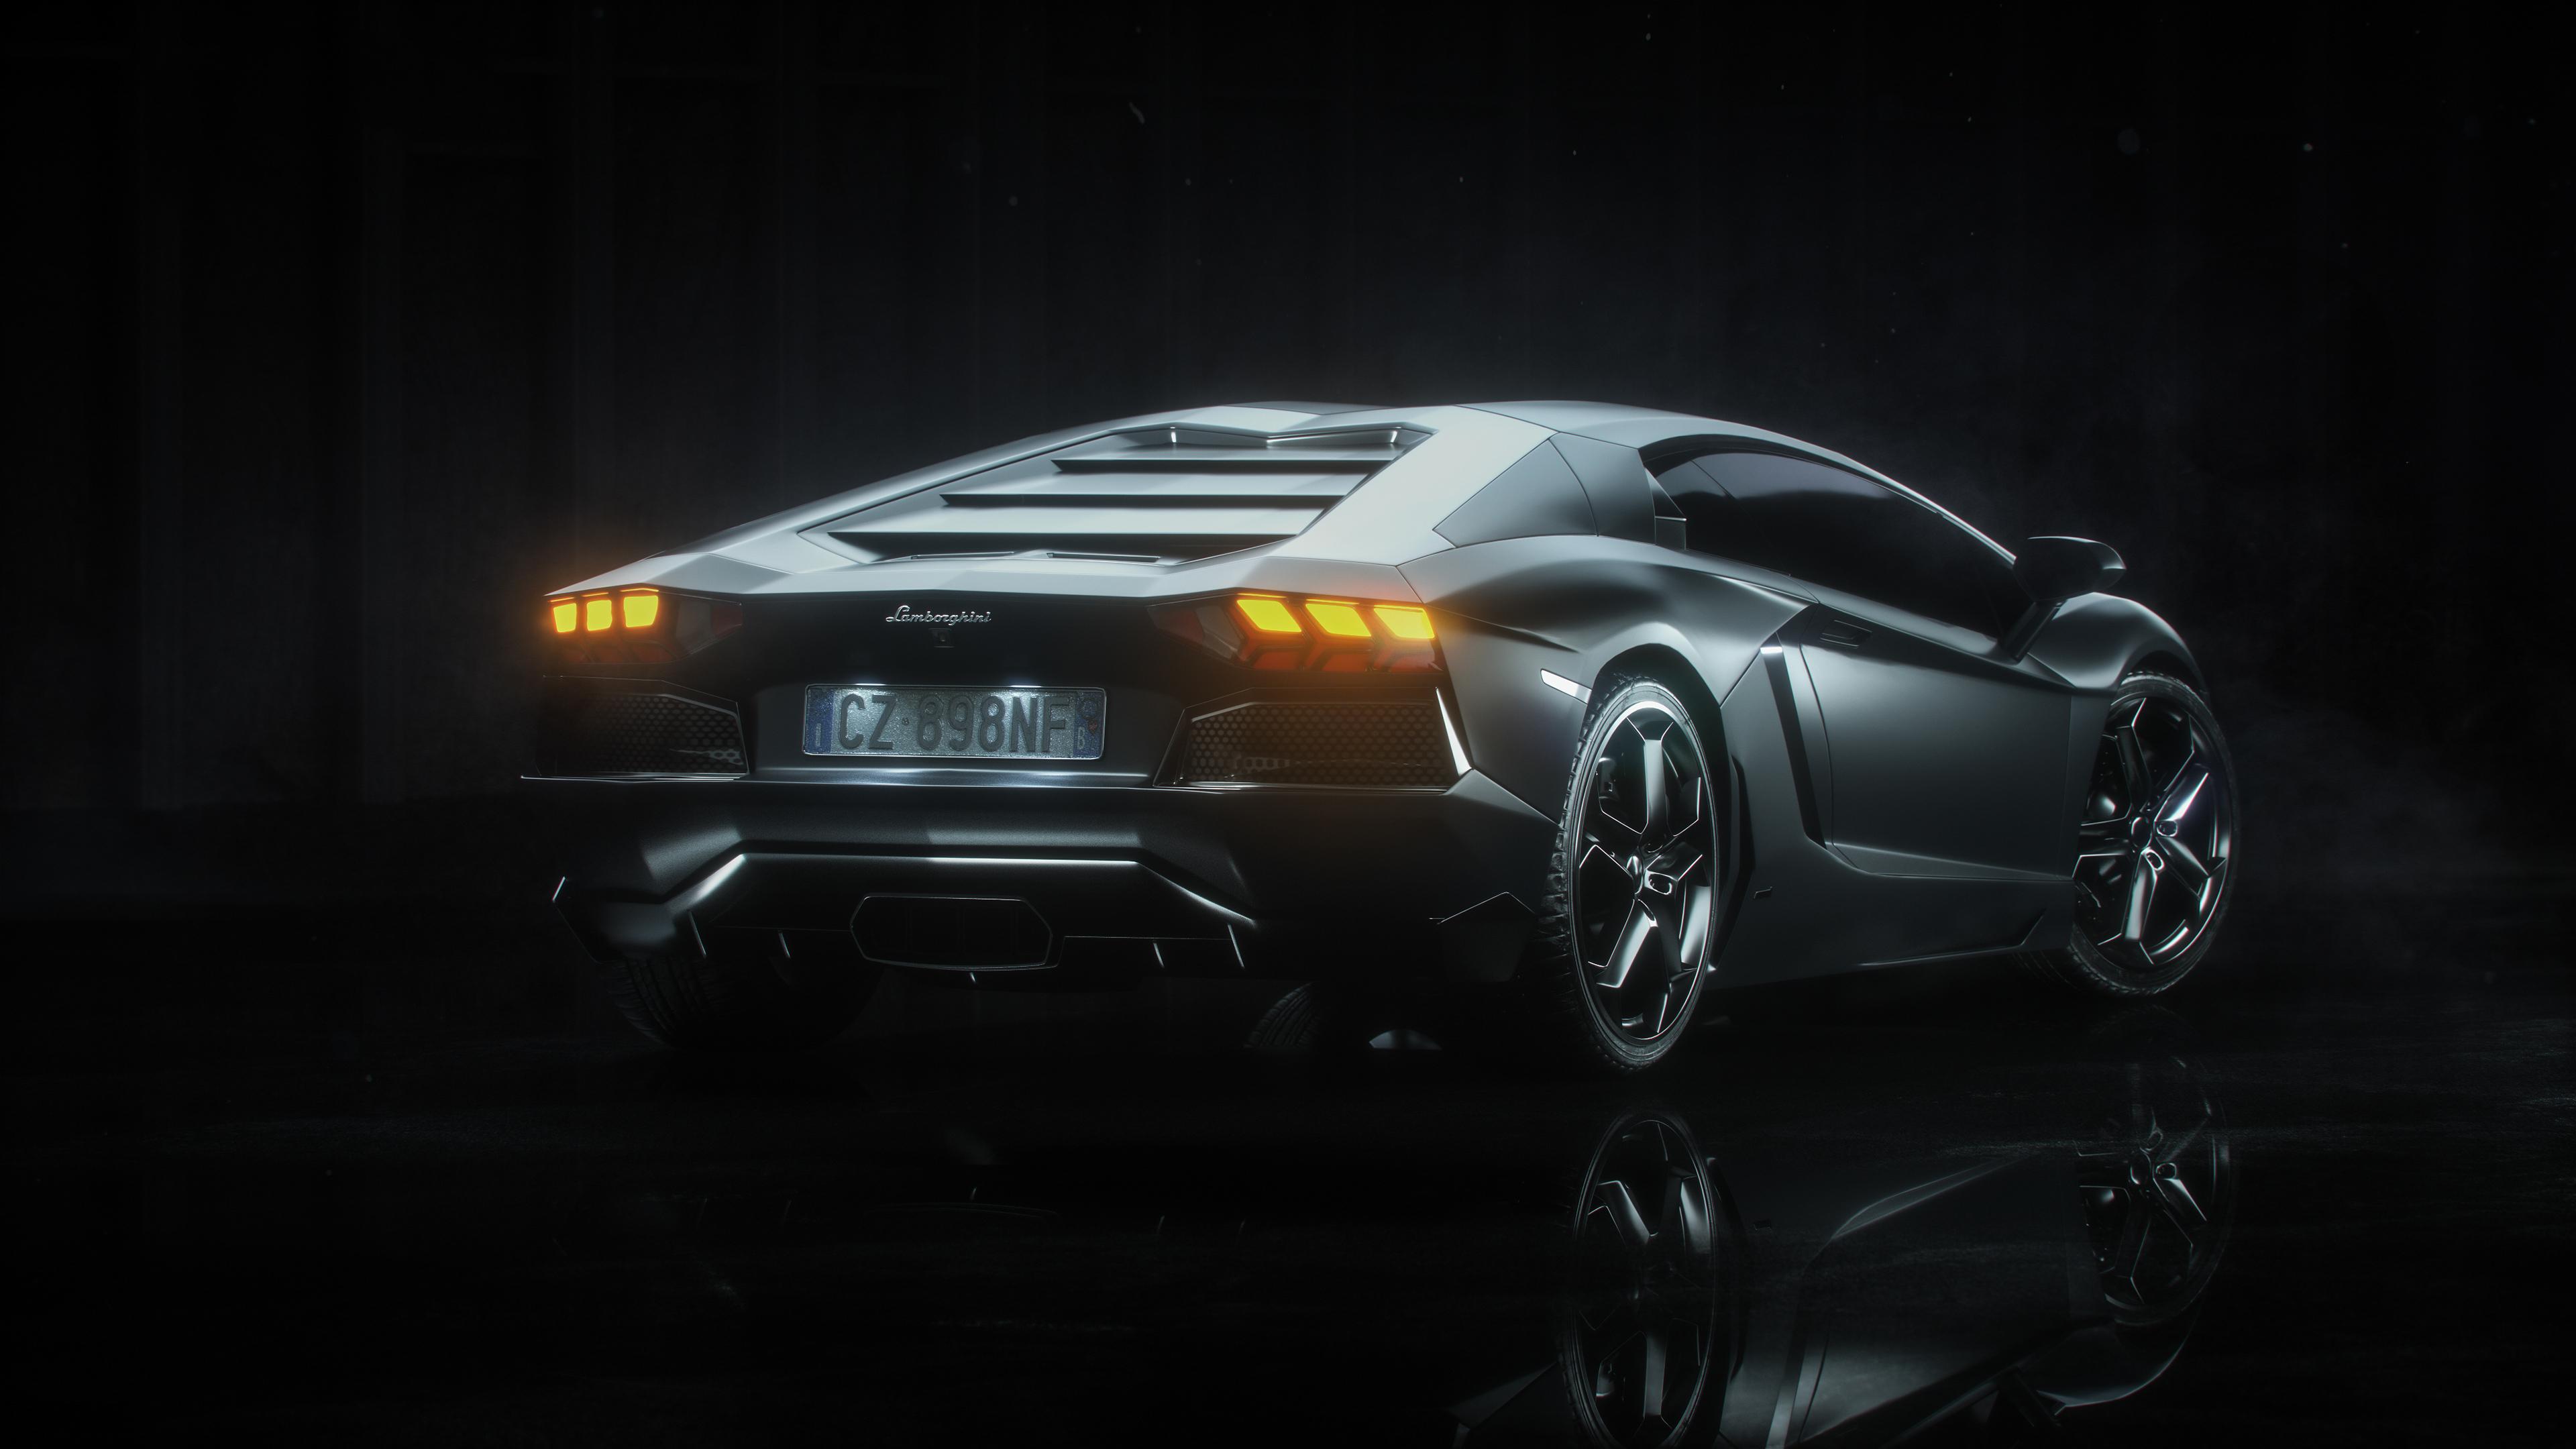 lamborghini cgi rear 1541294350 - Lamborghini Cgi Rear - lamborghini wallpapers, hd-wallpapers, cars wallpapers, behance wallpapers, 4k-wallpapers